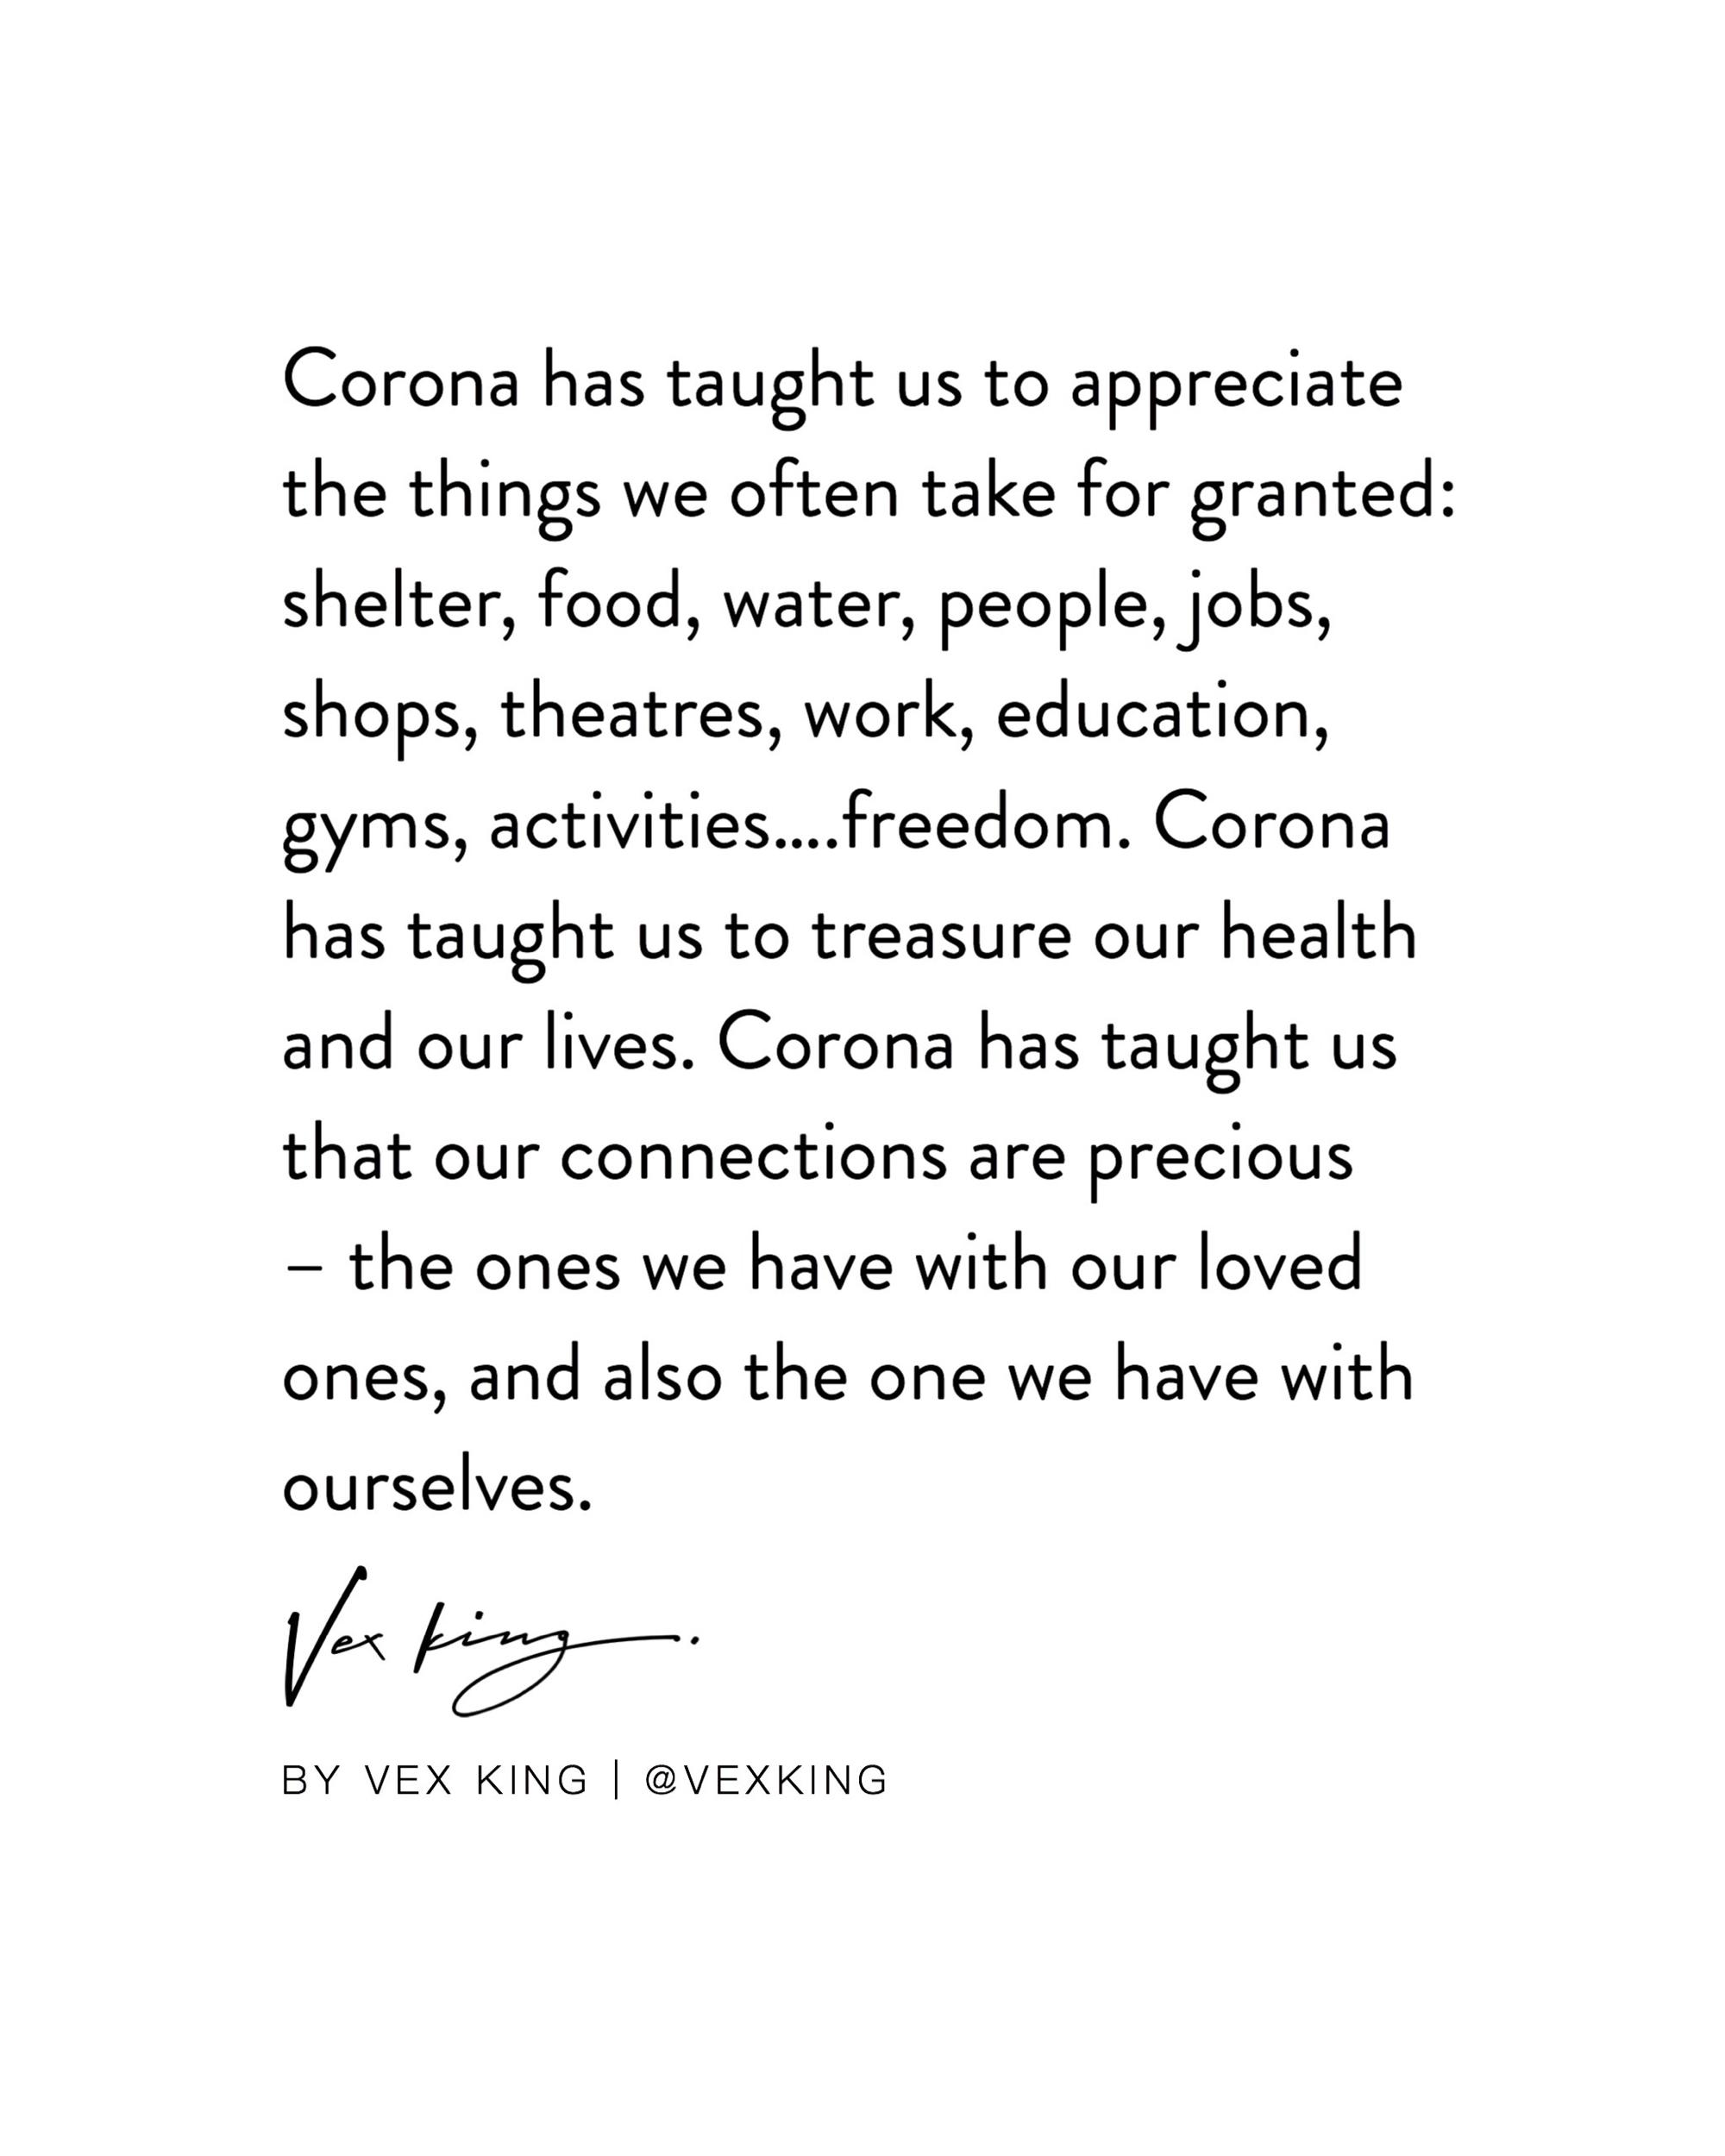 [Image] corona with some positivity